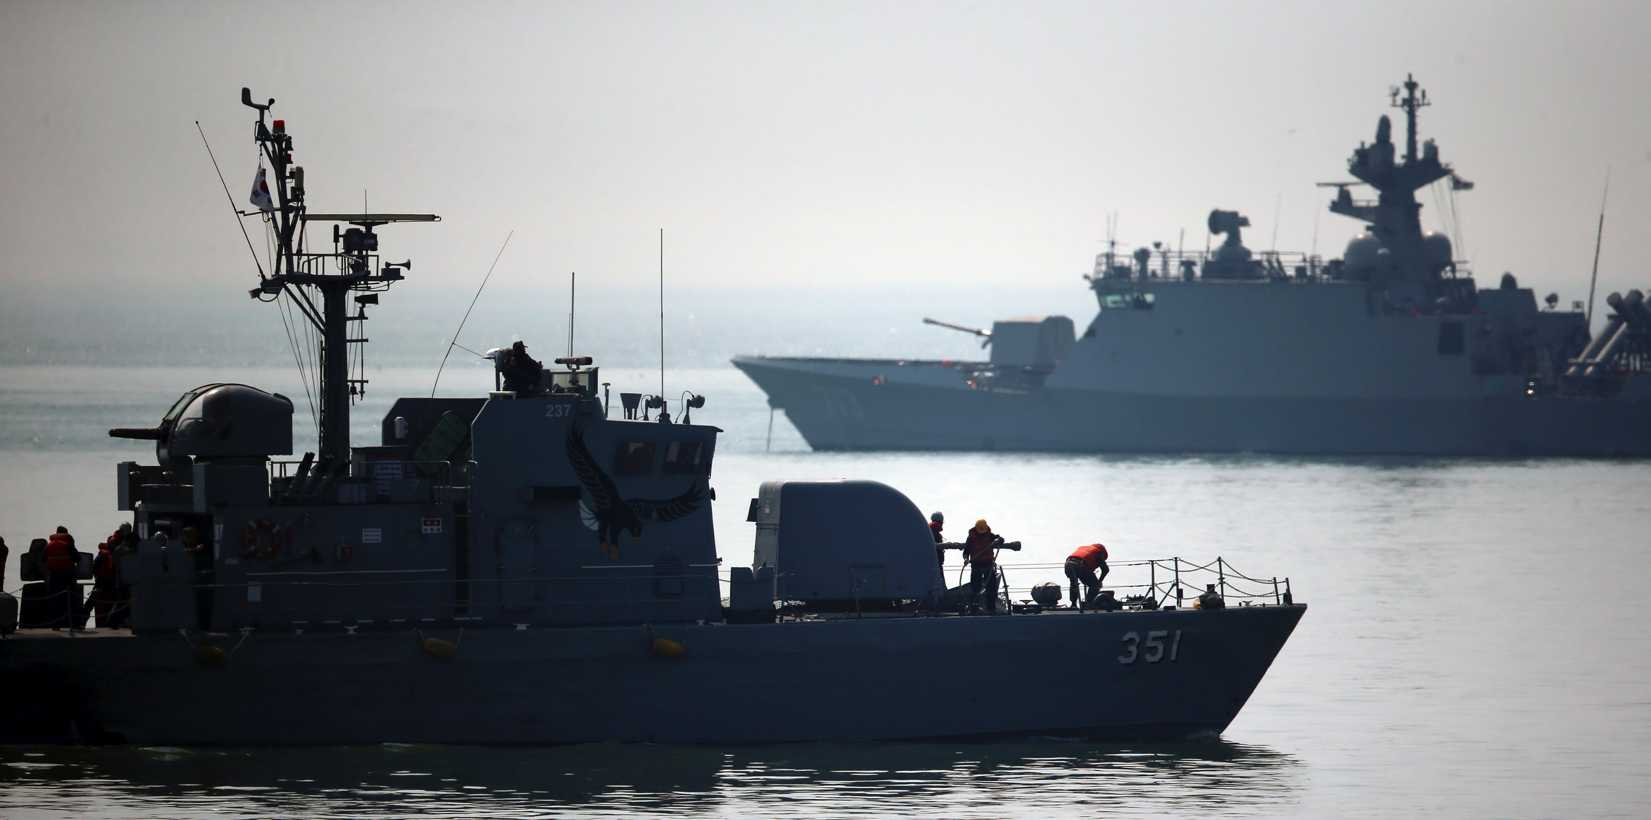 South Korean navy warships patrol around Daecheong island near the West Sea border with North Korea, Tuesday, April 1, 2014.